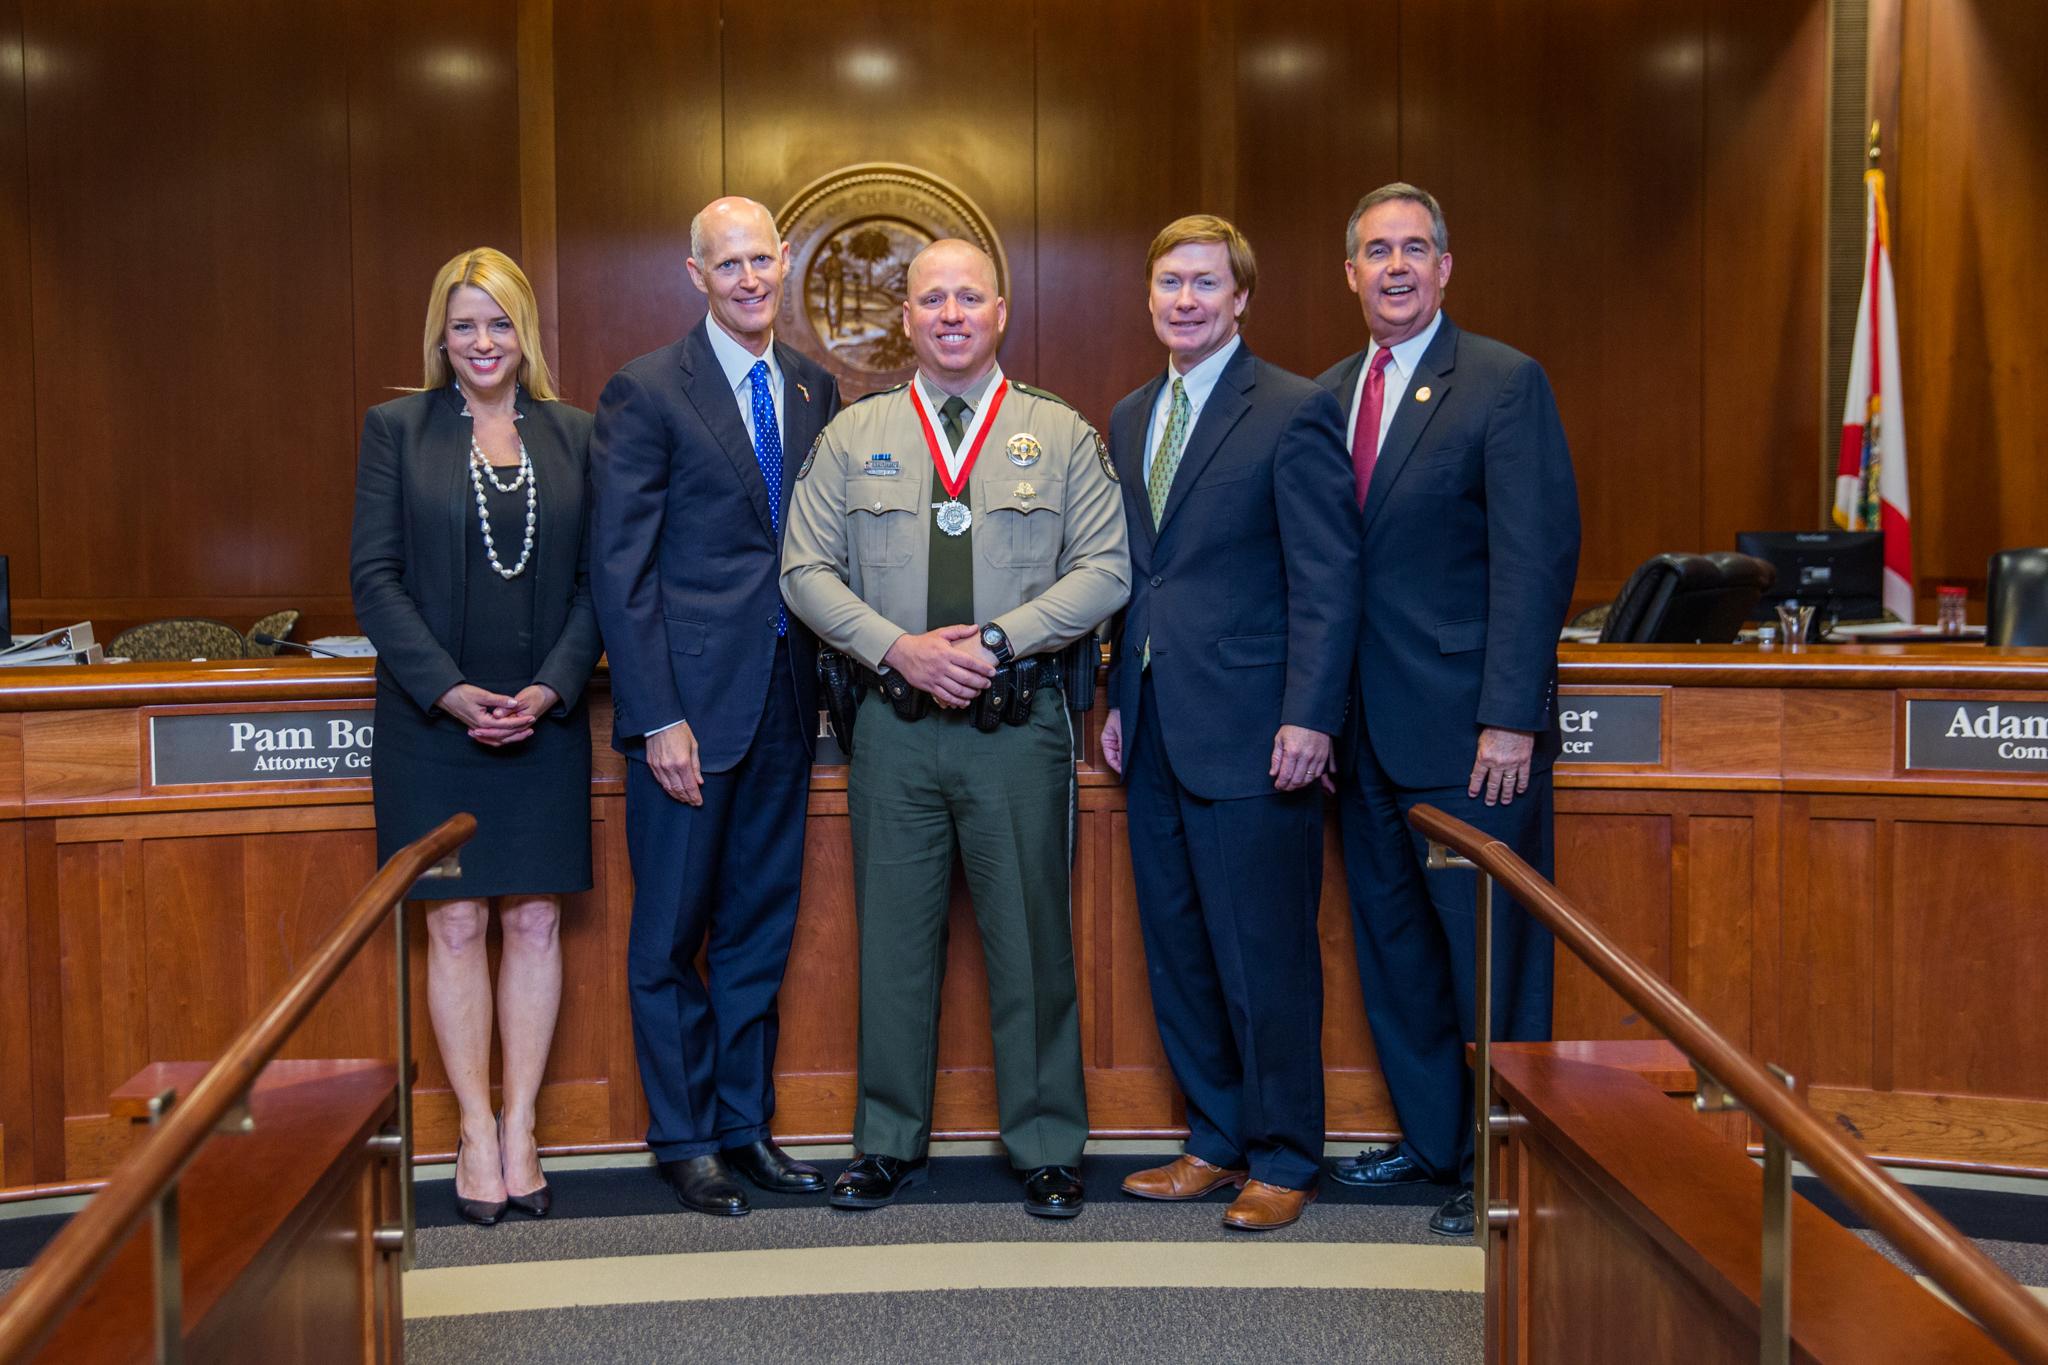 Scott U0026 The Florida Cabinet Recognized Jason Hutchinson For His Heroism.